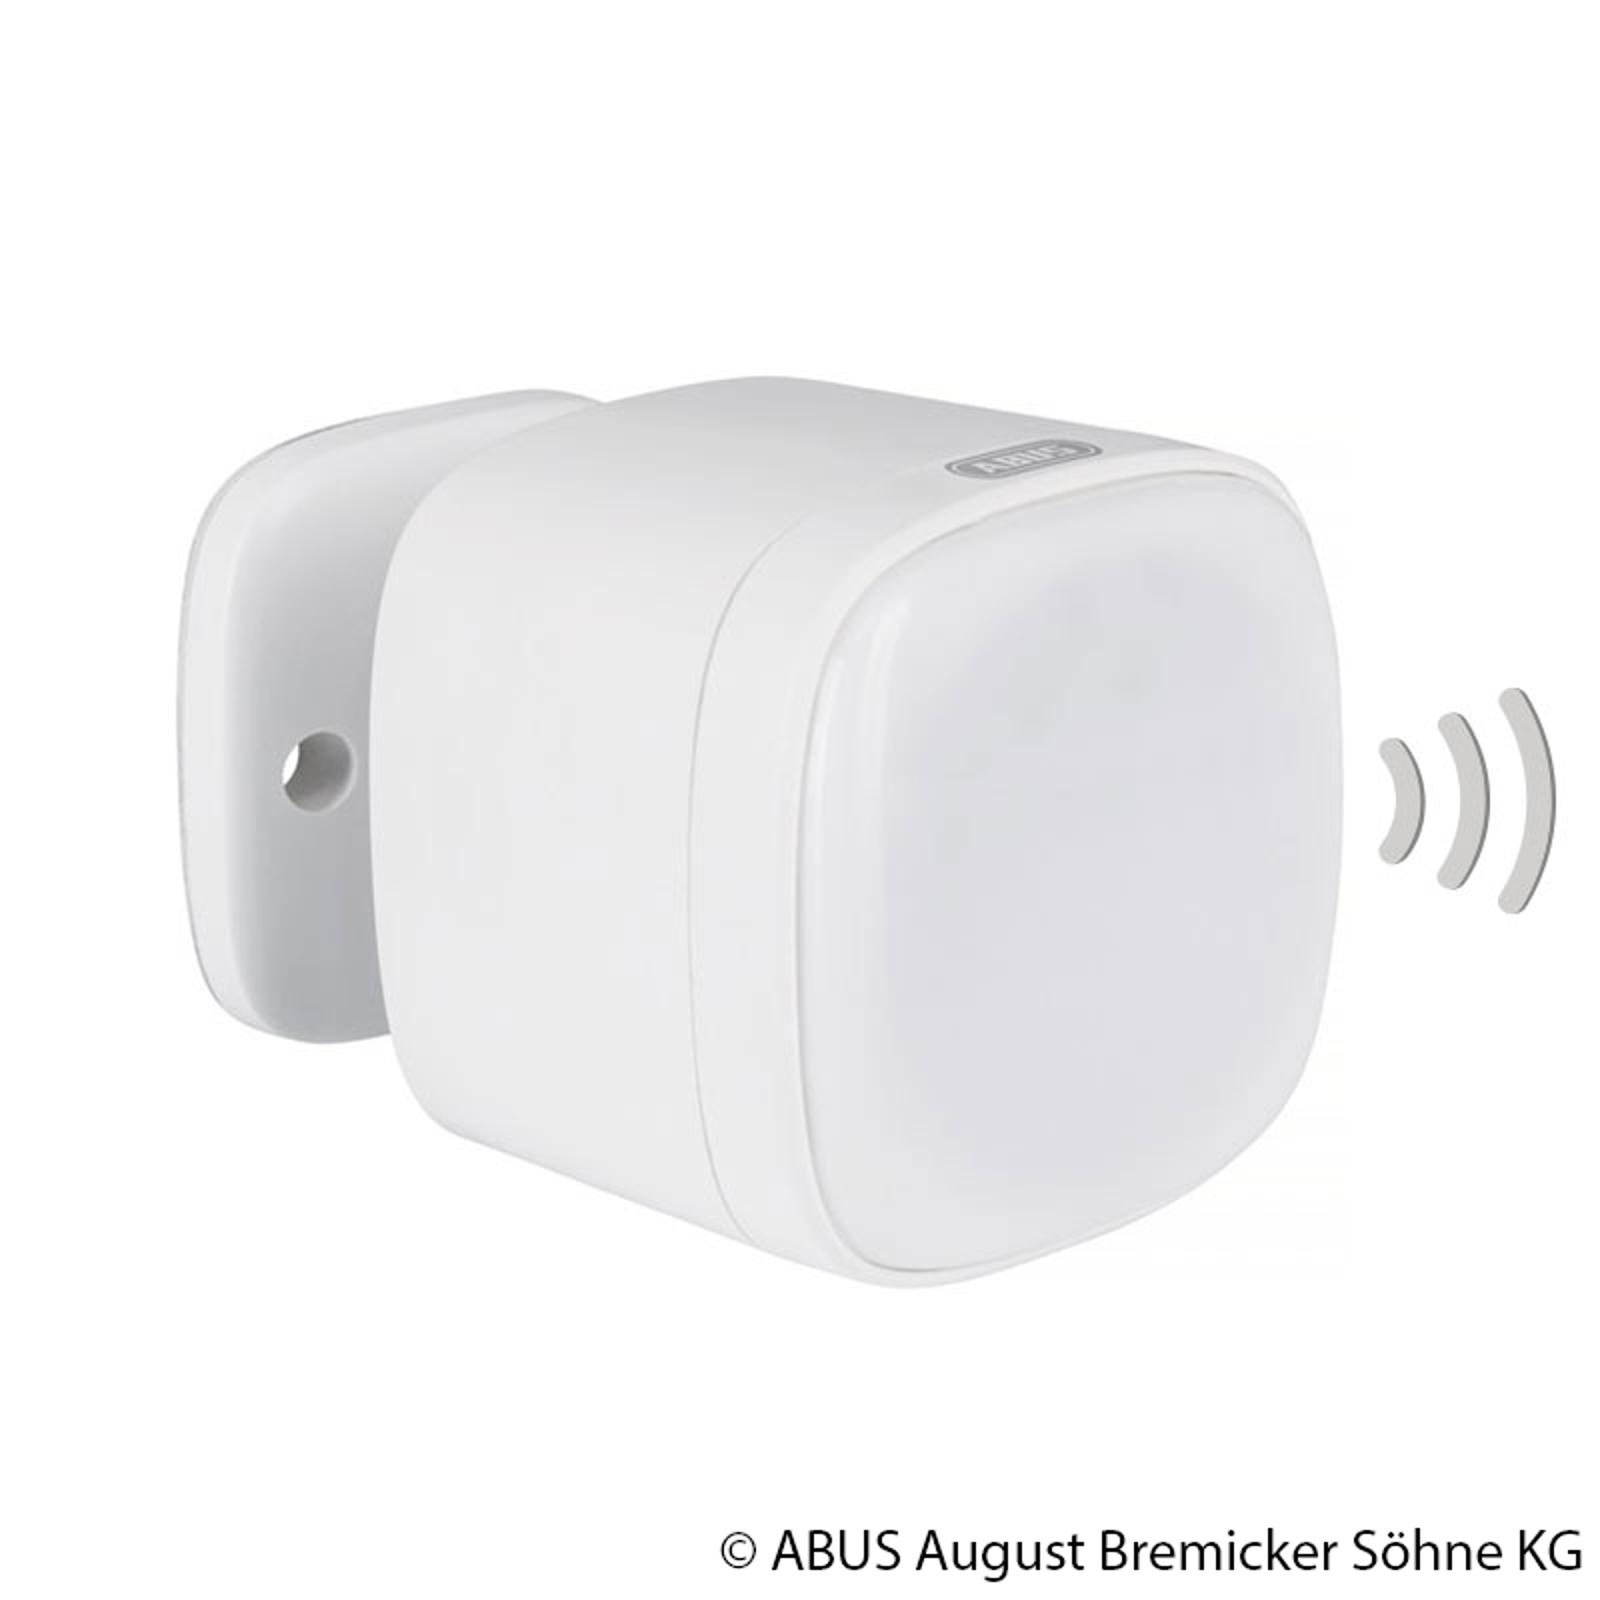 ABUS Z-Wave Funk-Multisensor